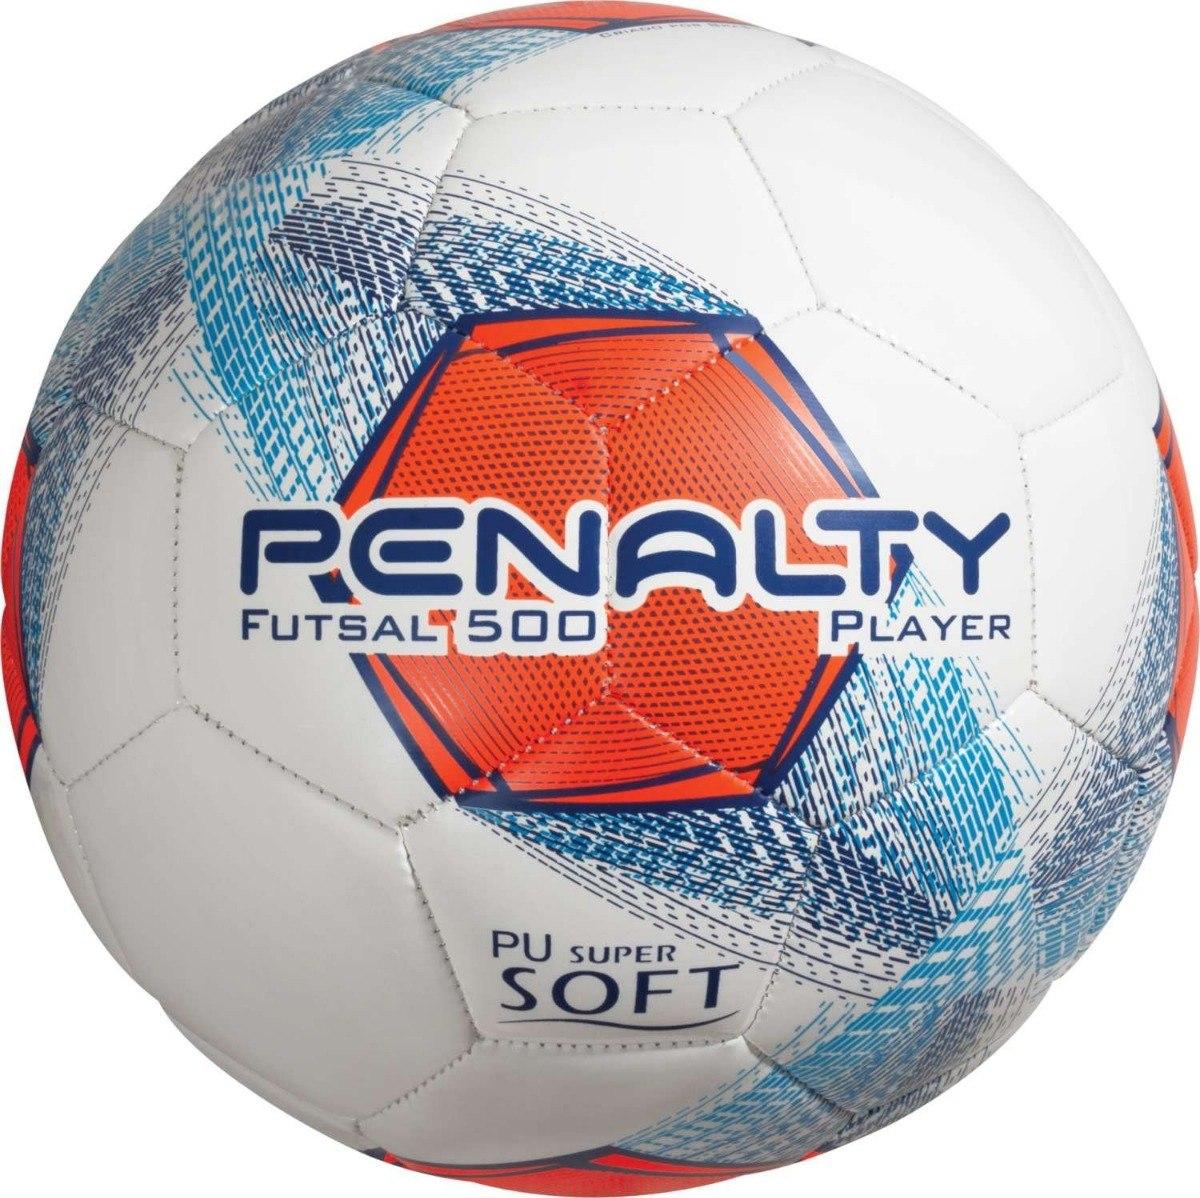 35d59bb257 Bola De Futebol De Salão Futsal 500 Player Penalty (2018) - R  70